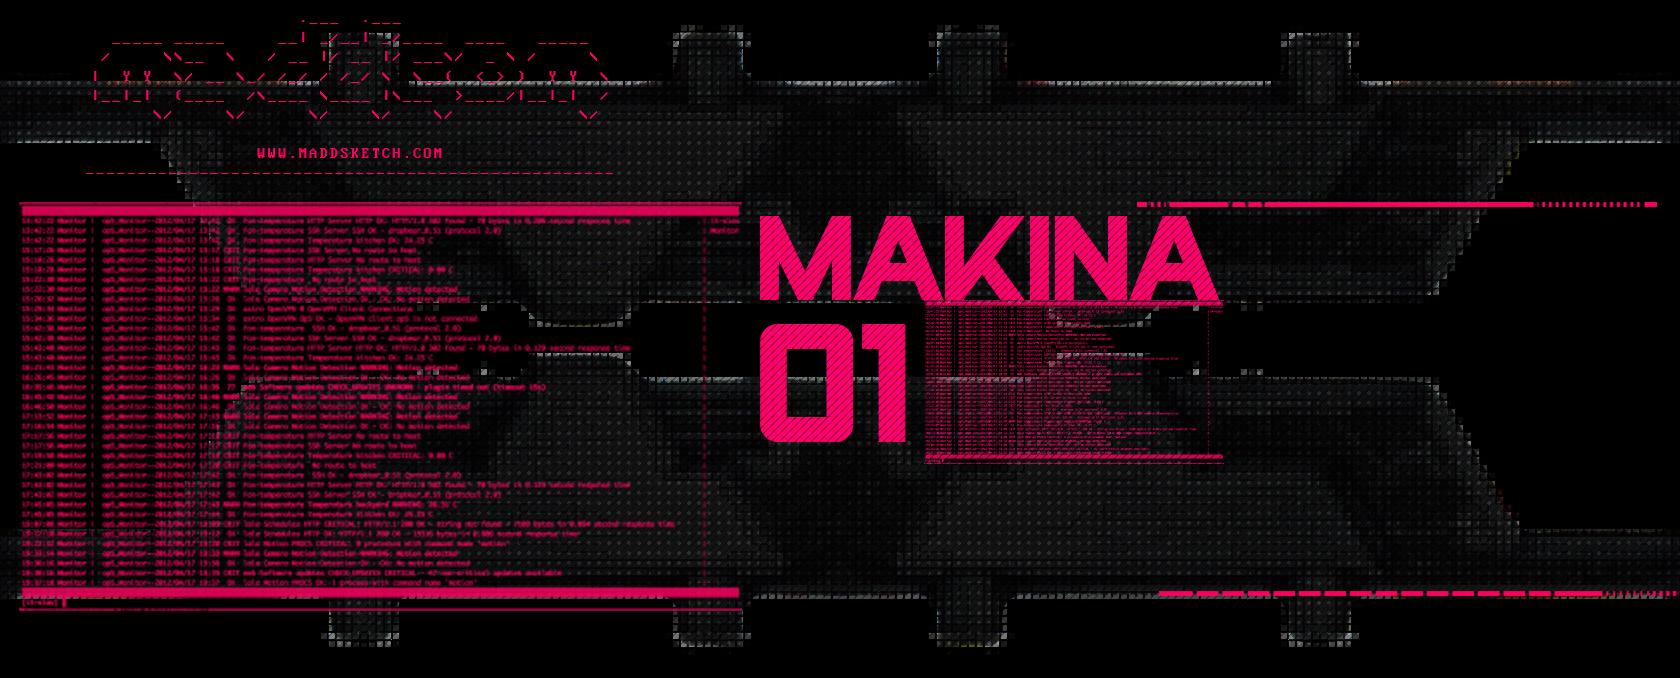 Makina 01